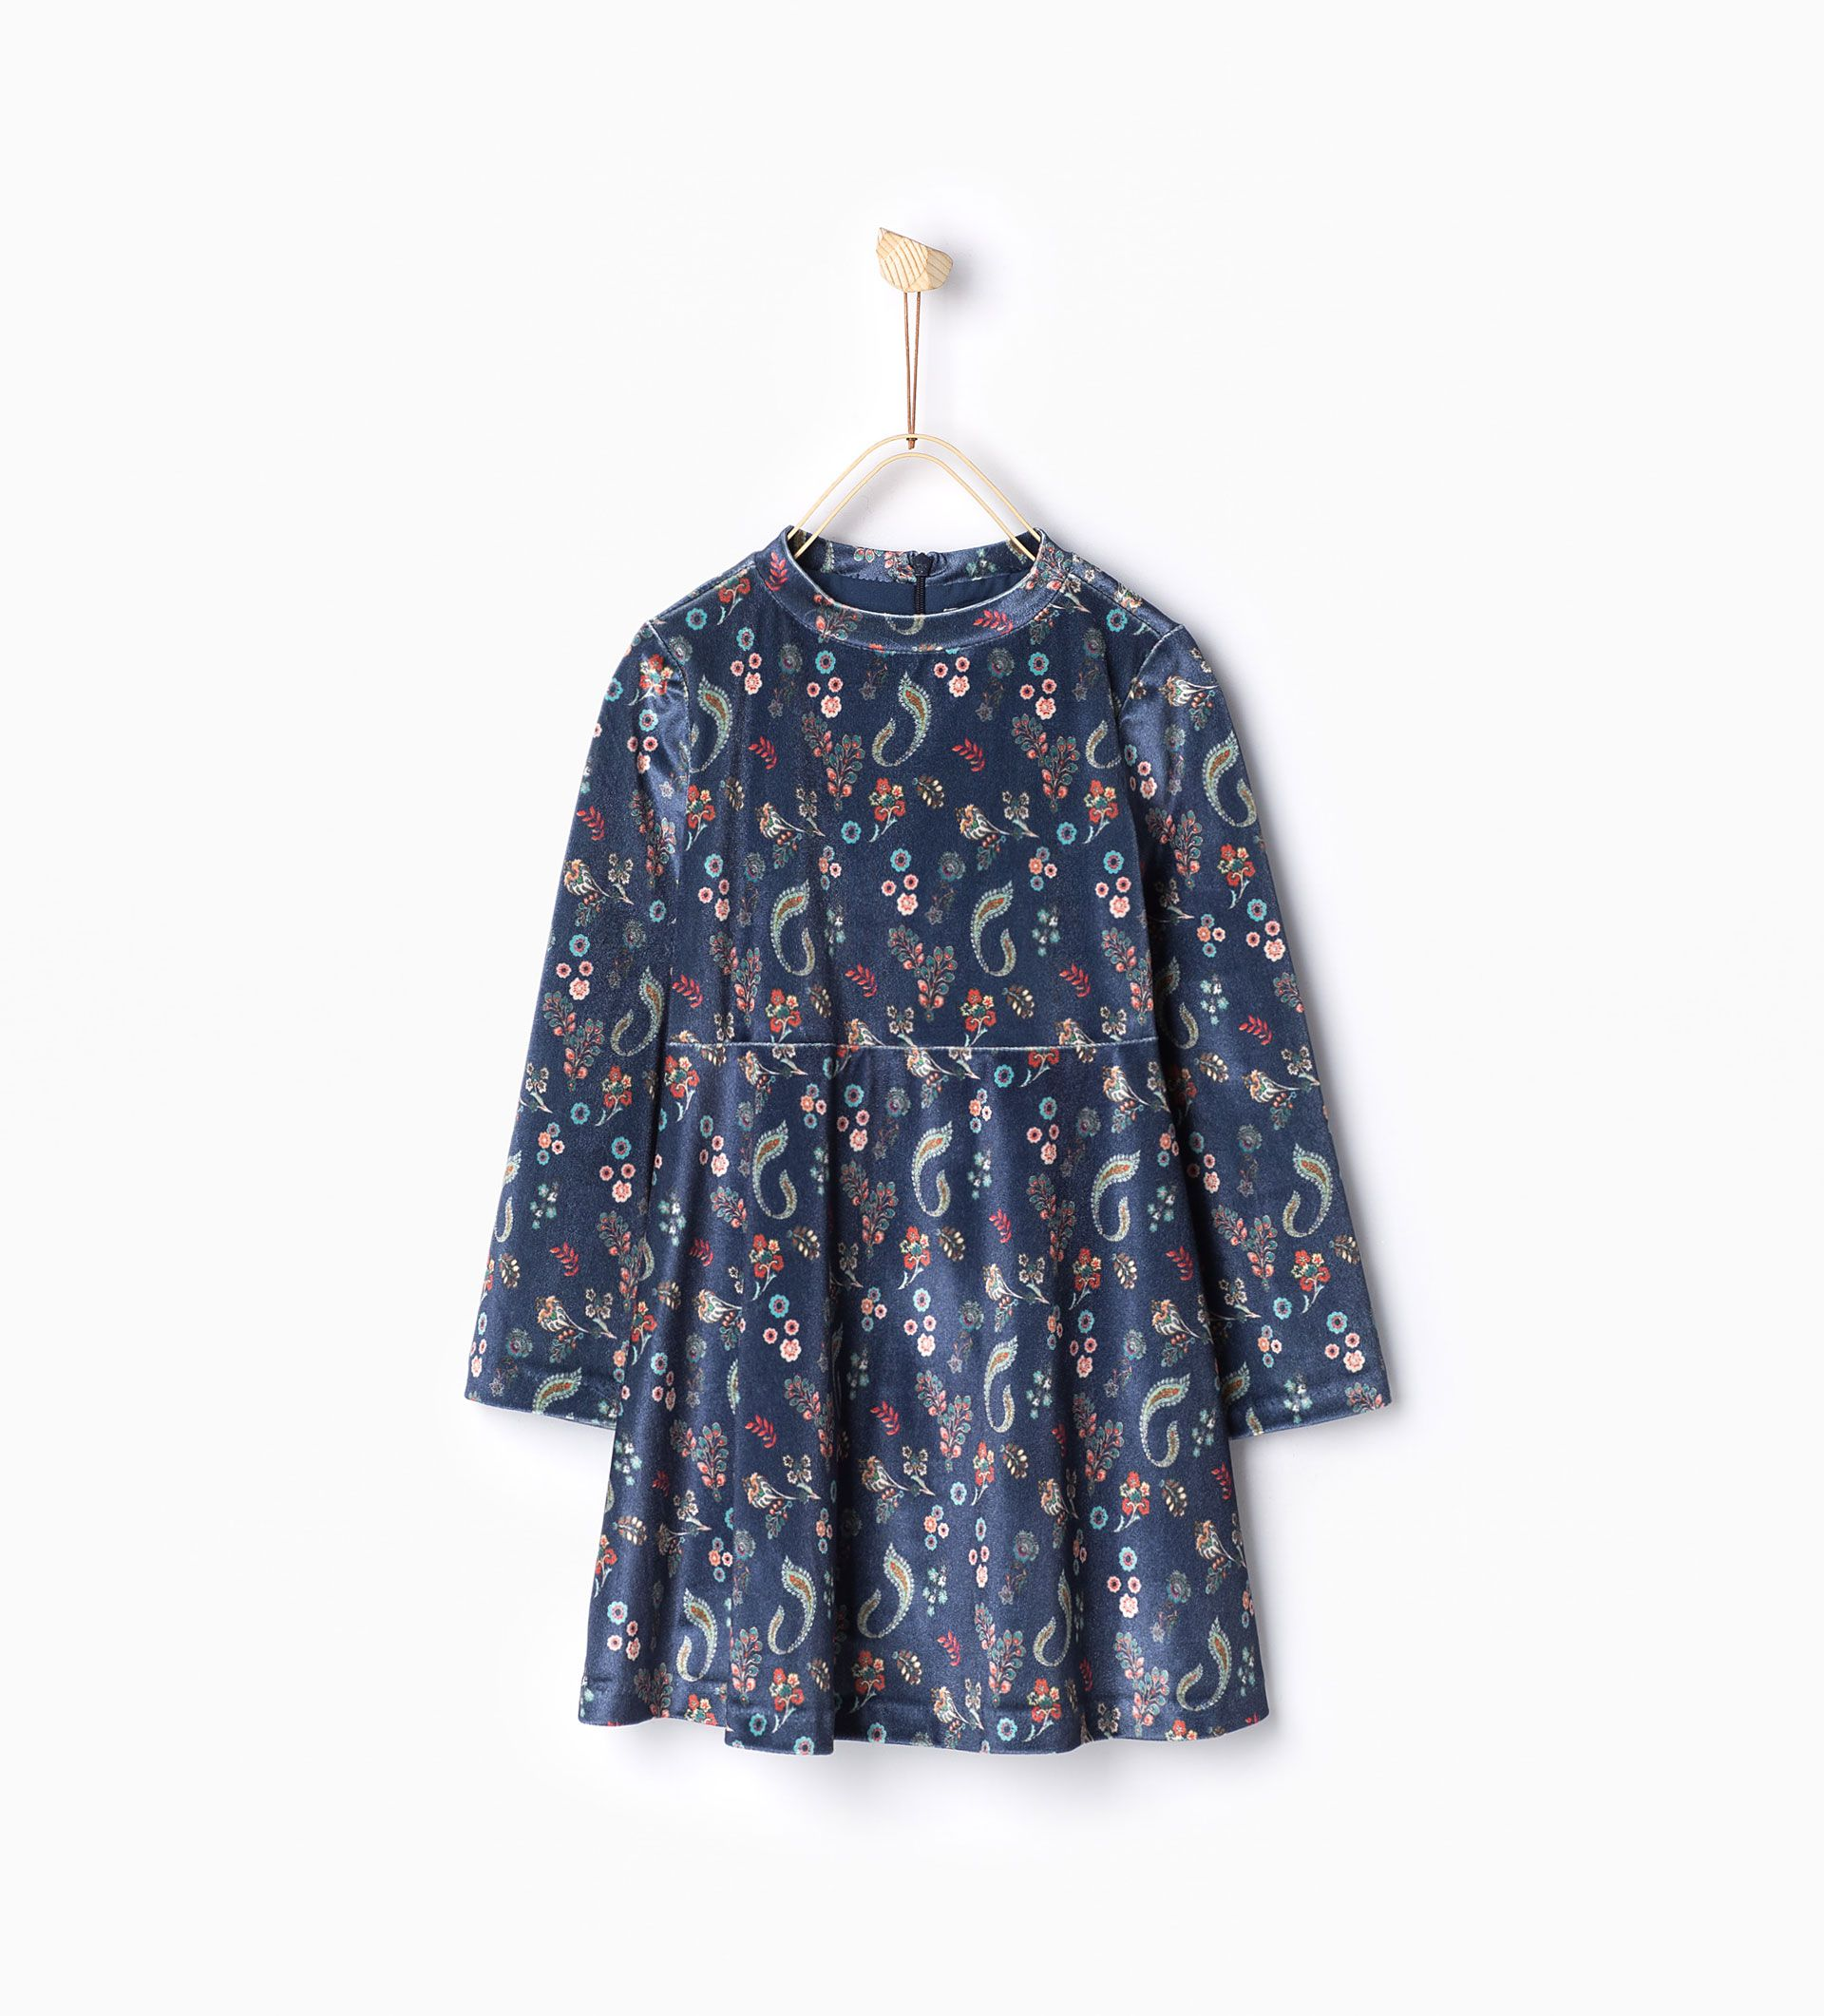 ZARA - KIDS - Printed velvet dress | Kidswear trends, Girl ...